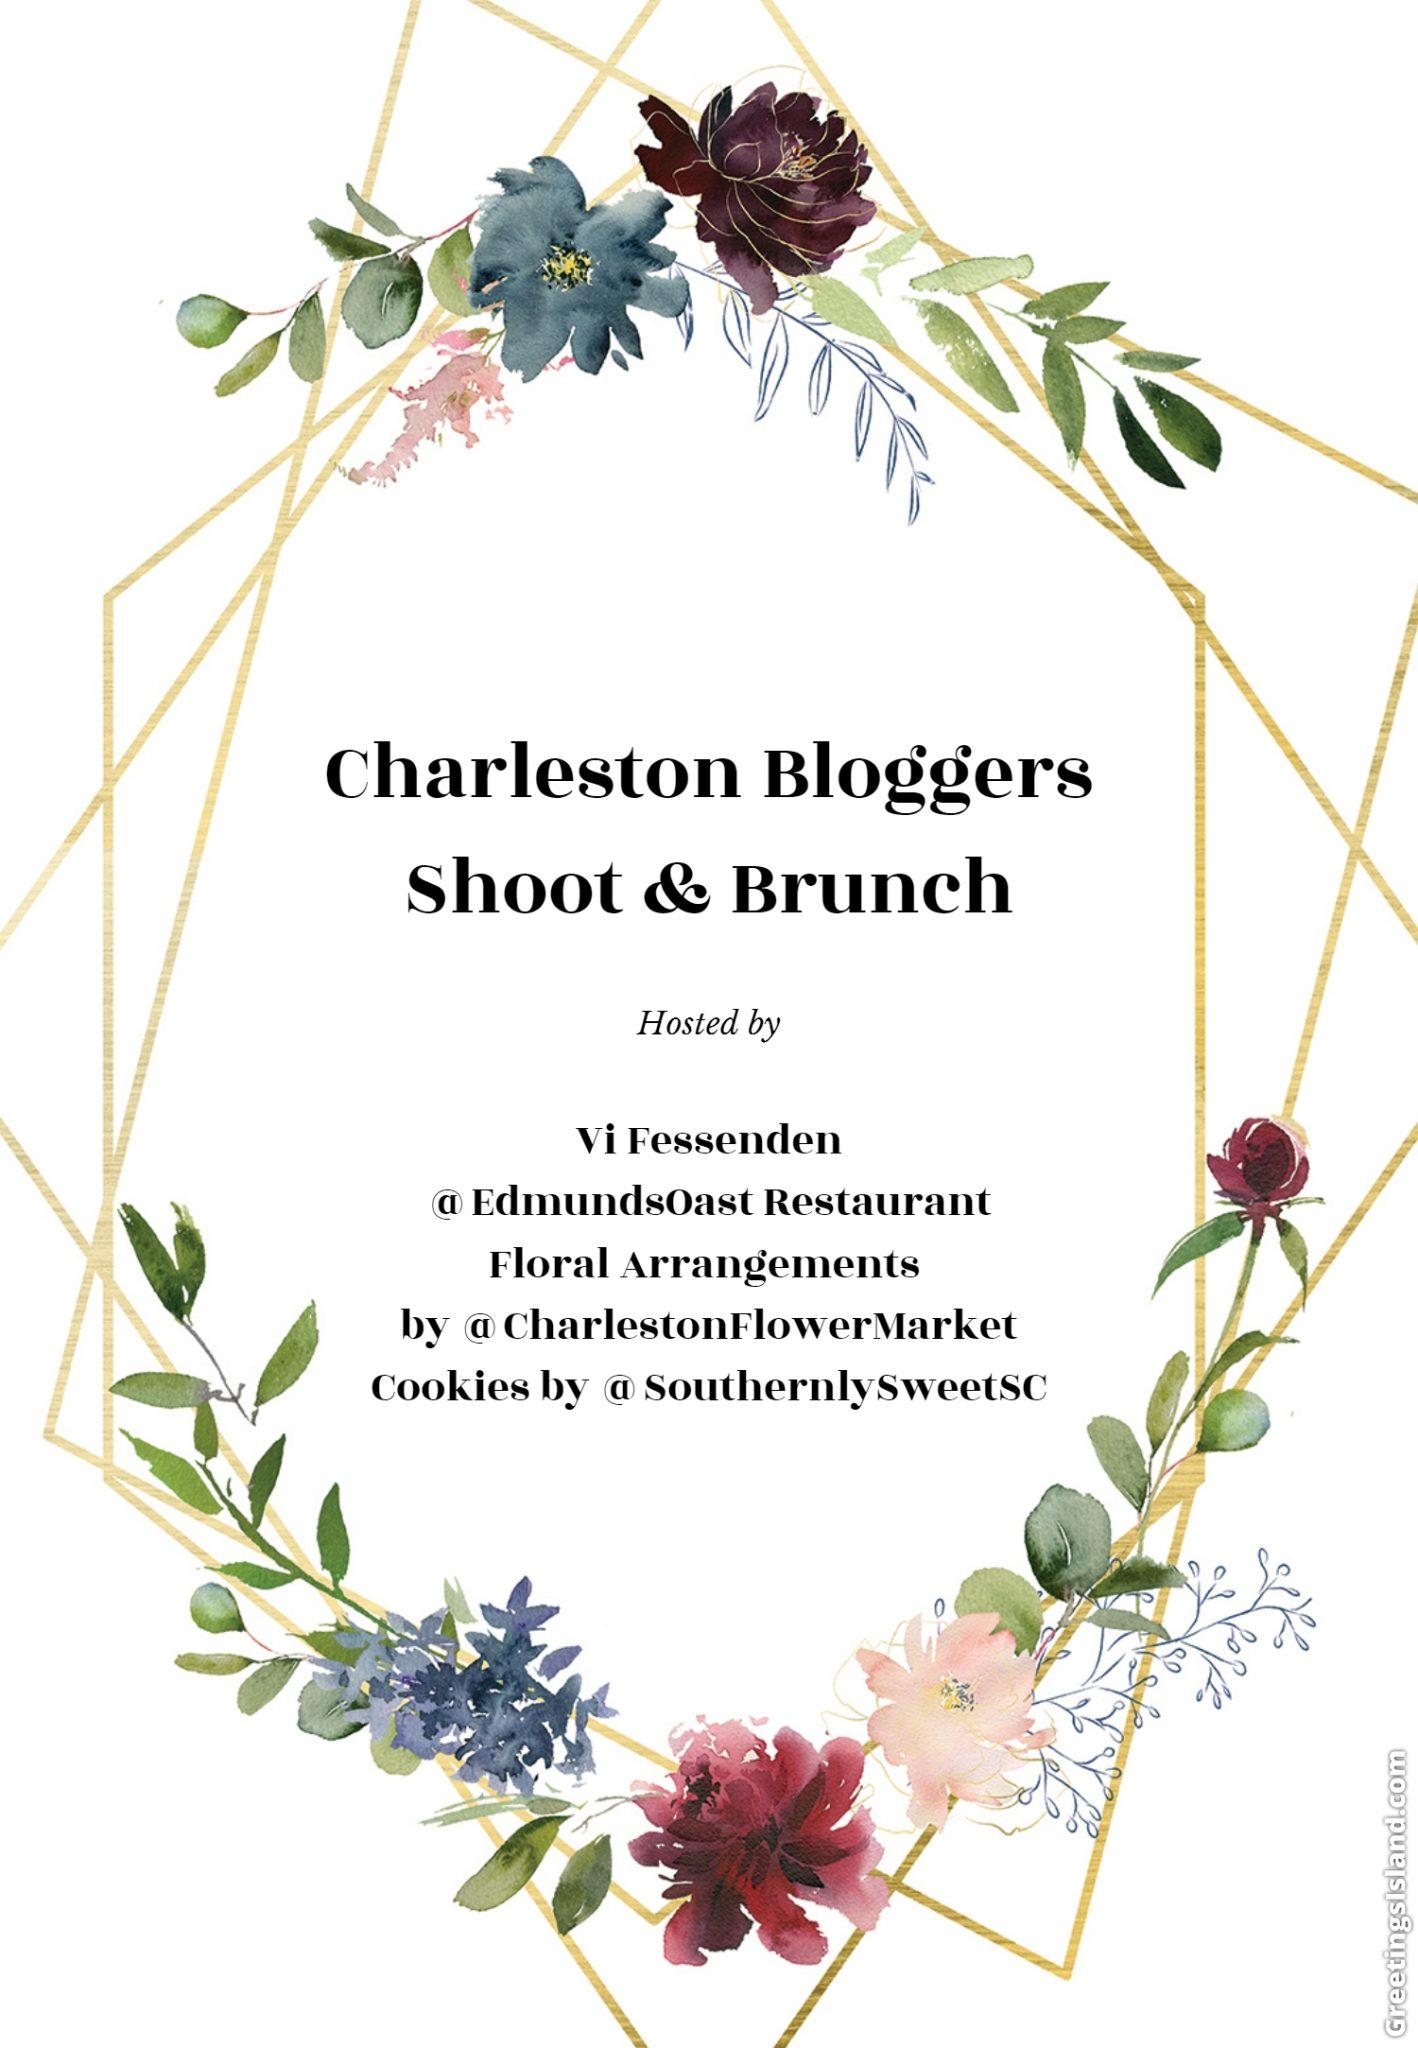 April's Charleston Bloggers Shoot & Brunch Event!